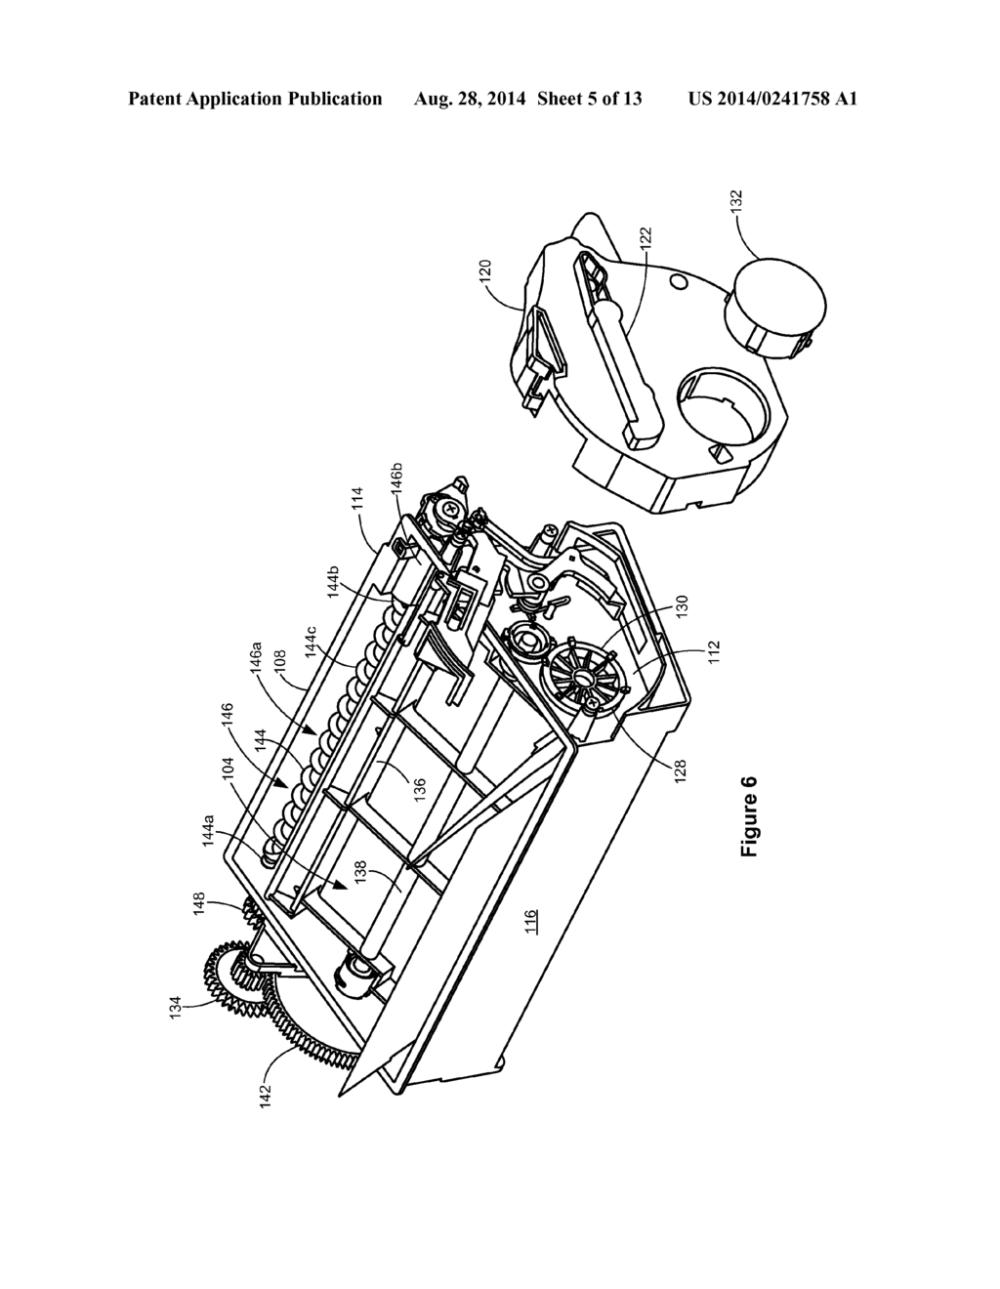 medium resolution of toner cartridge having a shutter lock mechanism diagram schematic and image 06